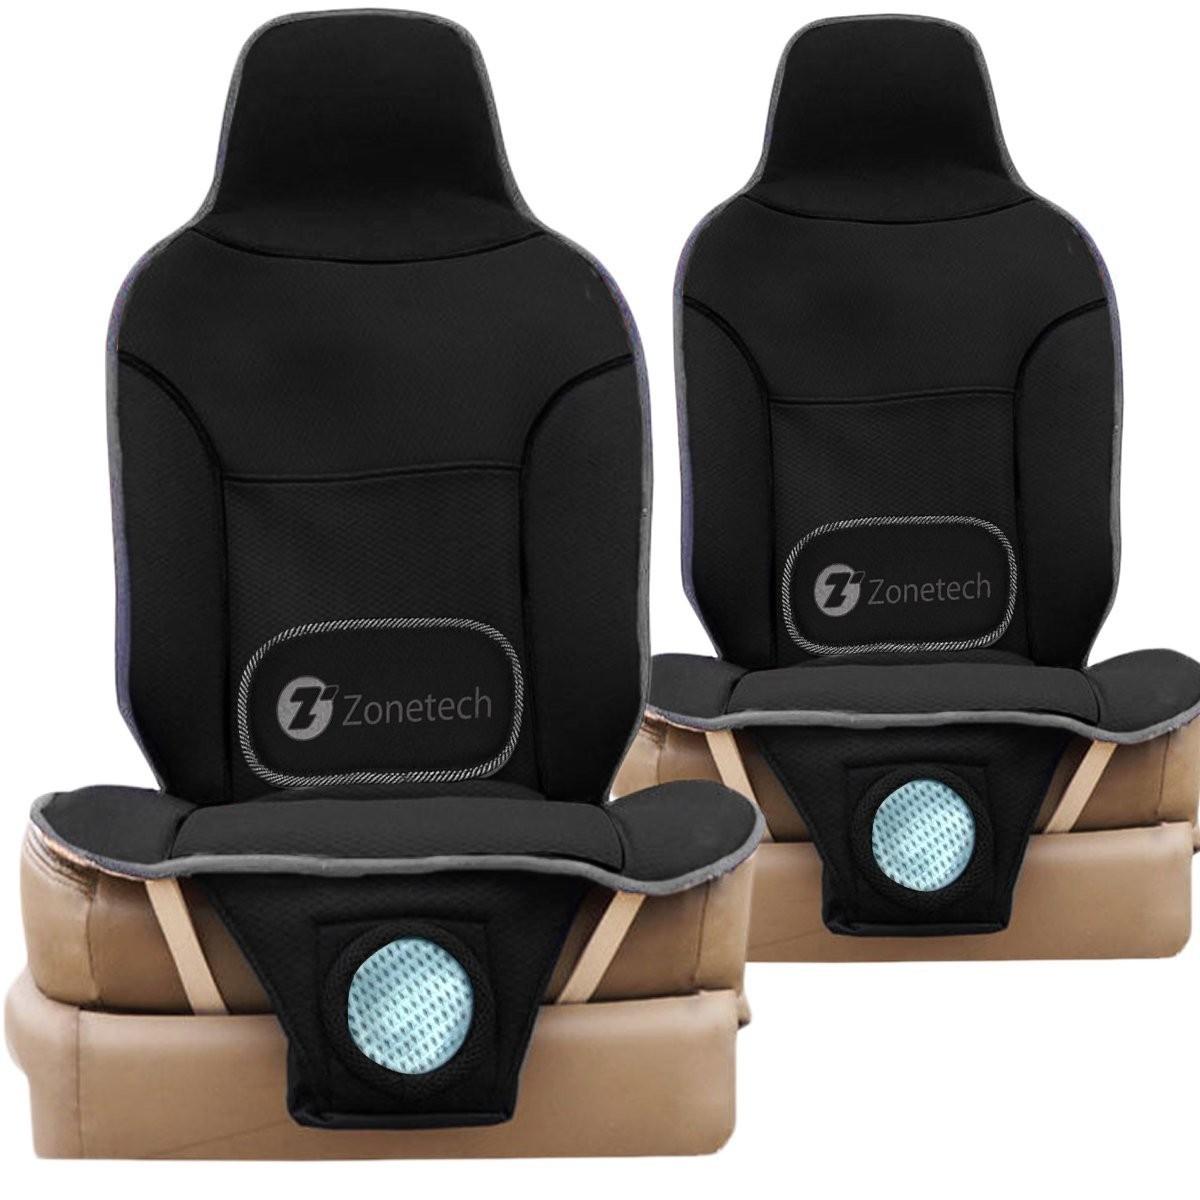 Auto Accessories  Headlight bulbs  Car Gifts Zone Tech 3-in-1 Car Seat Cushion - 2-Pack Black